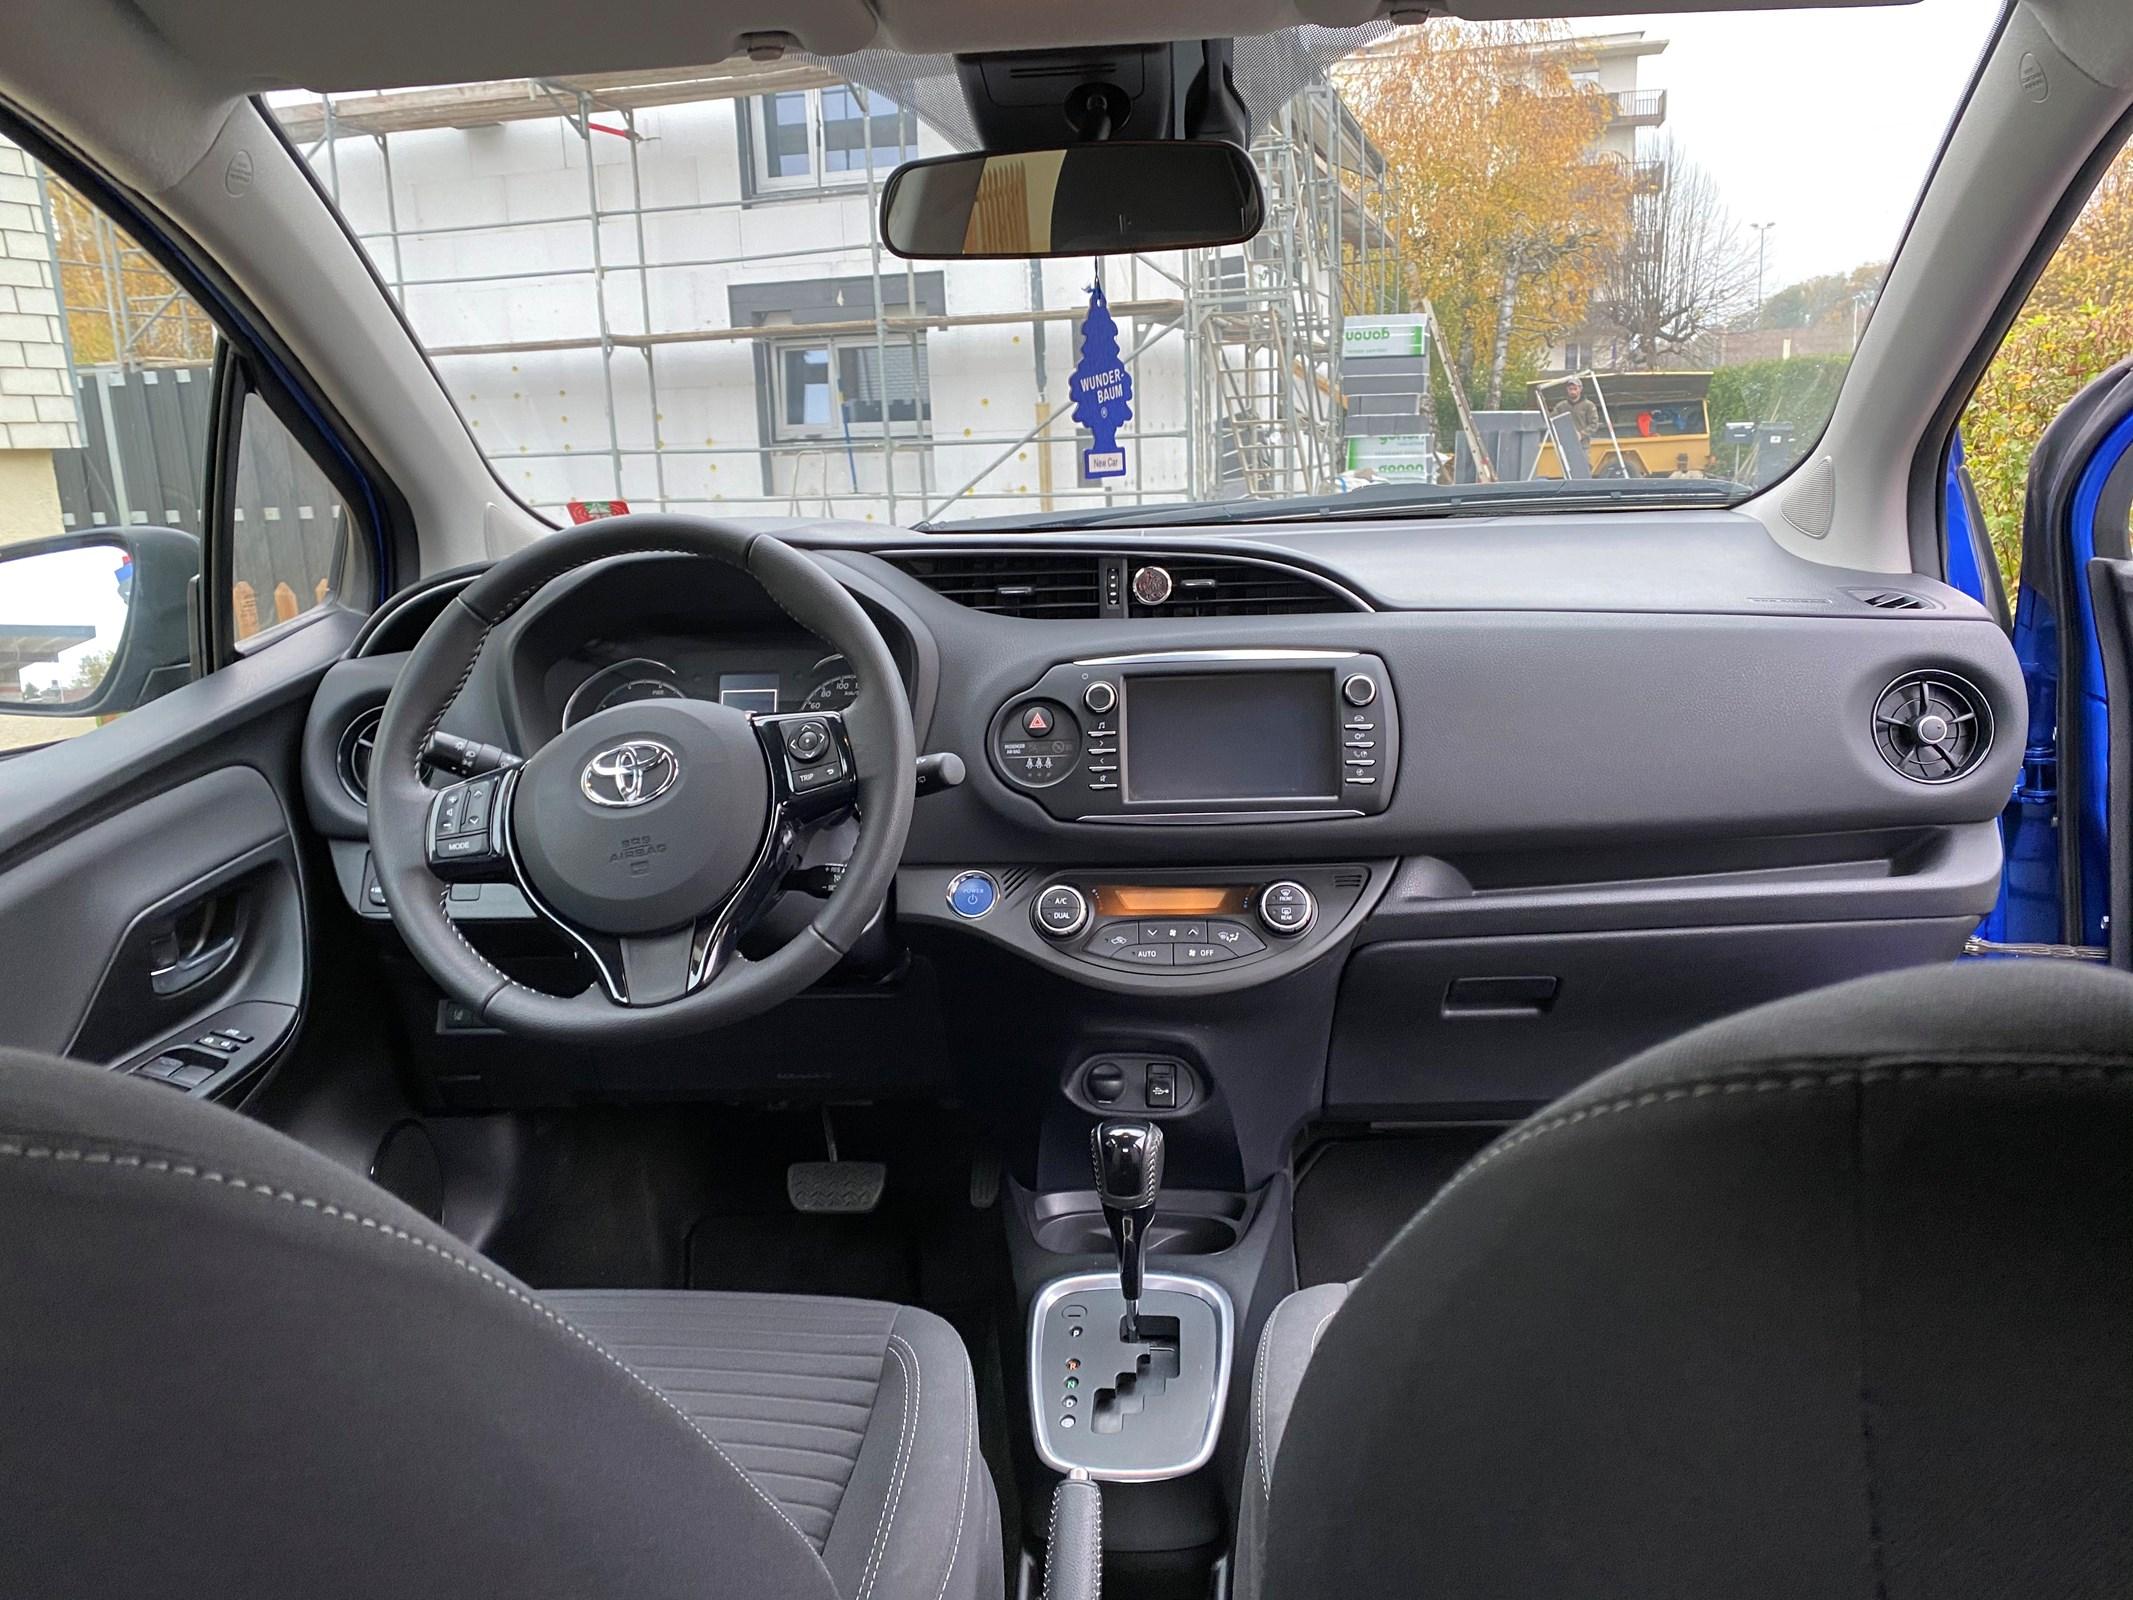 Toyota Yaris 1.5 VVT-i HSD Trend